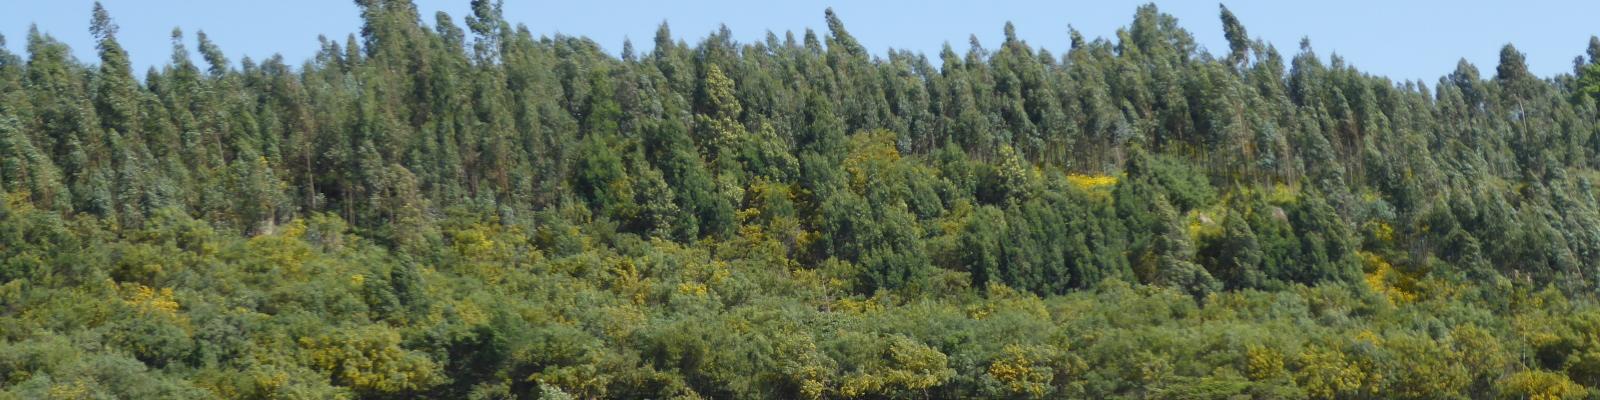 Reforestation & climate